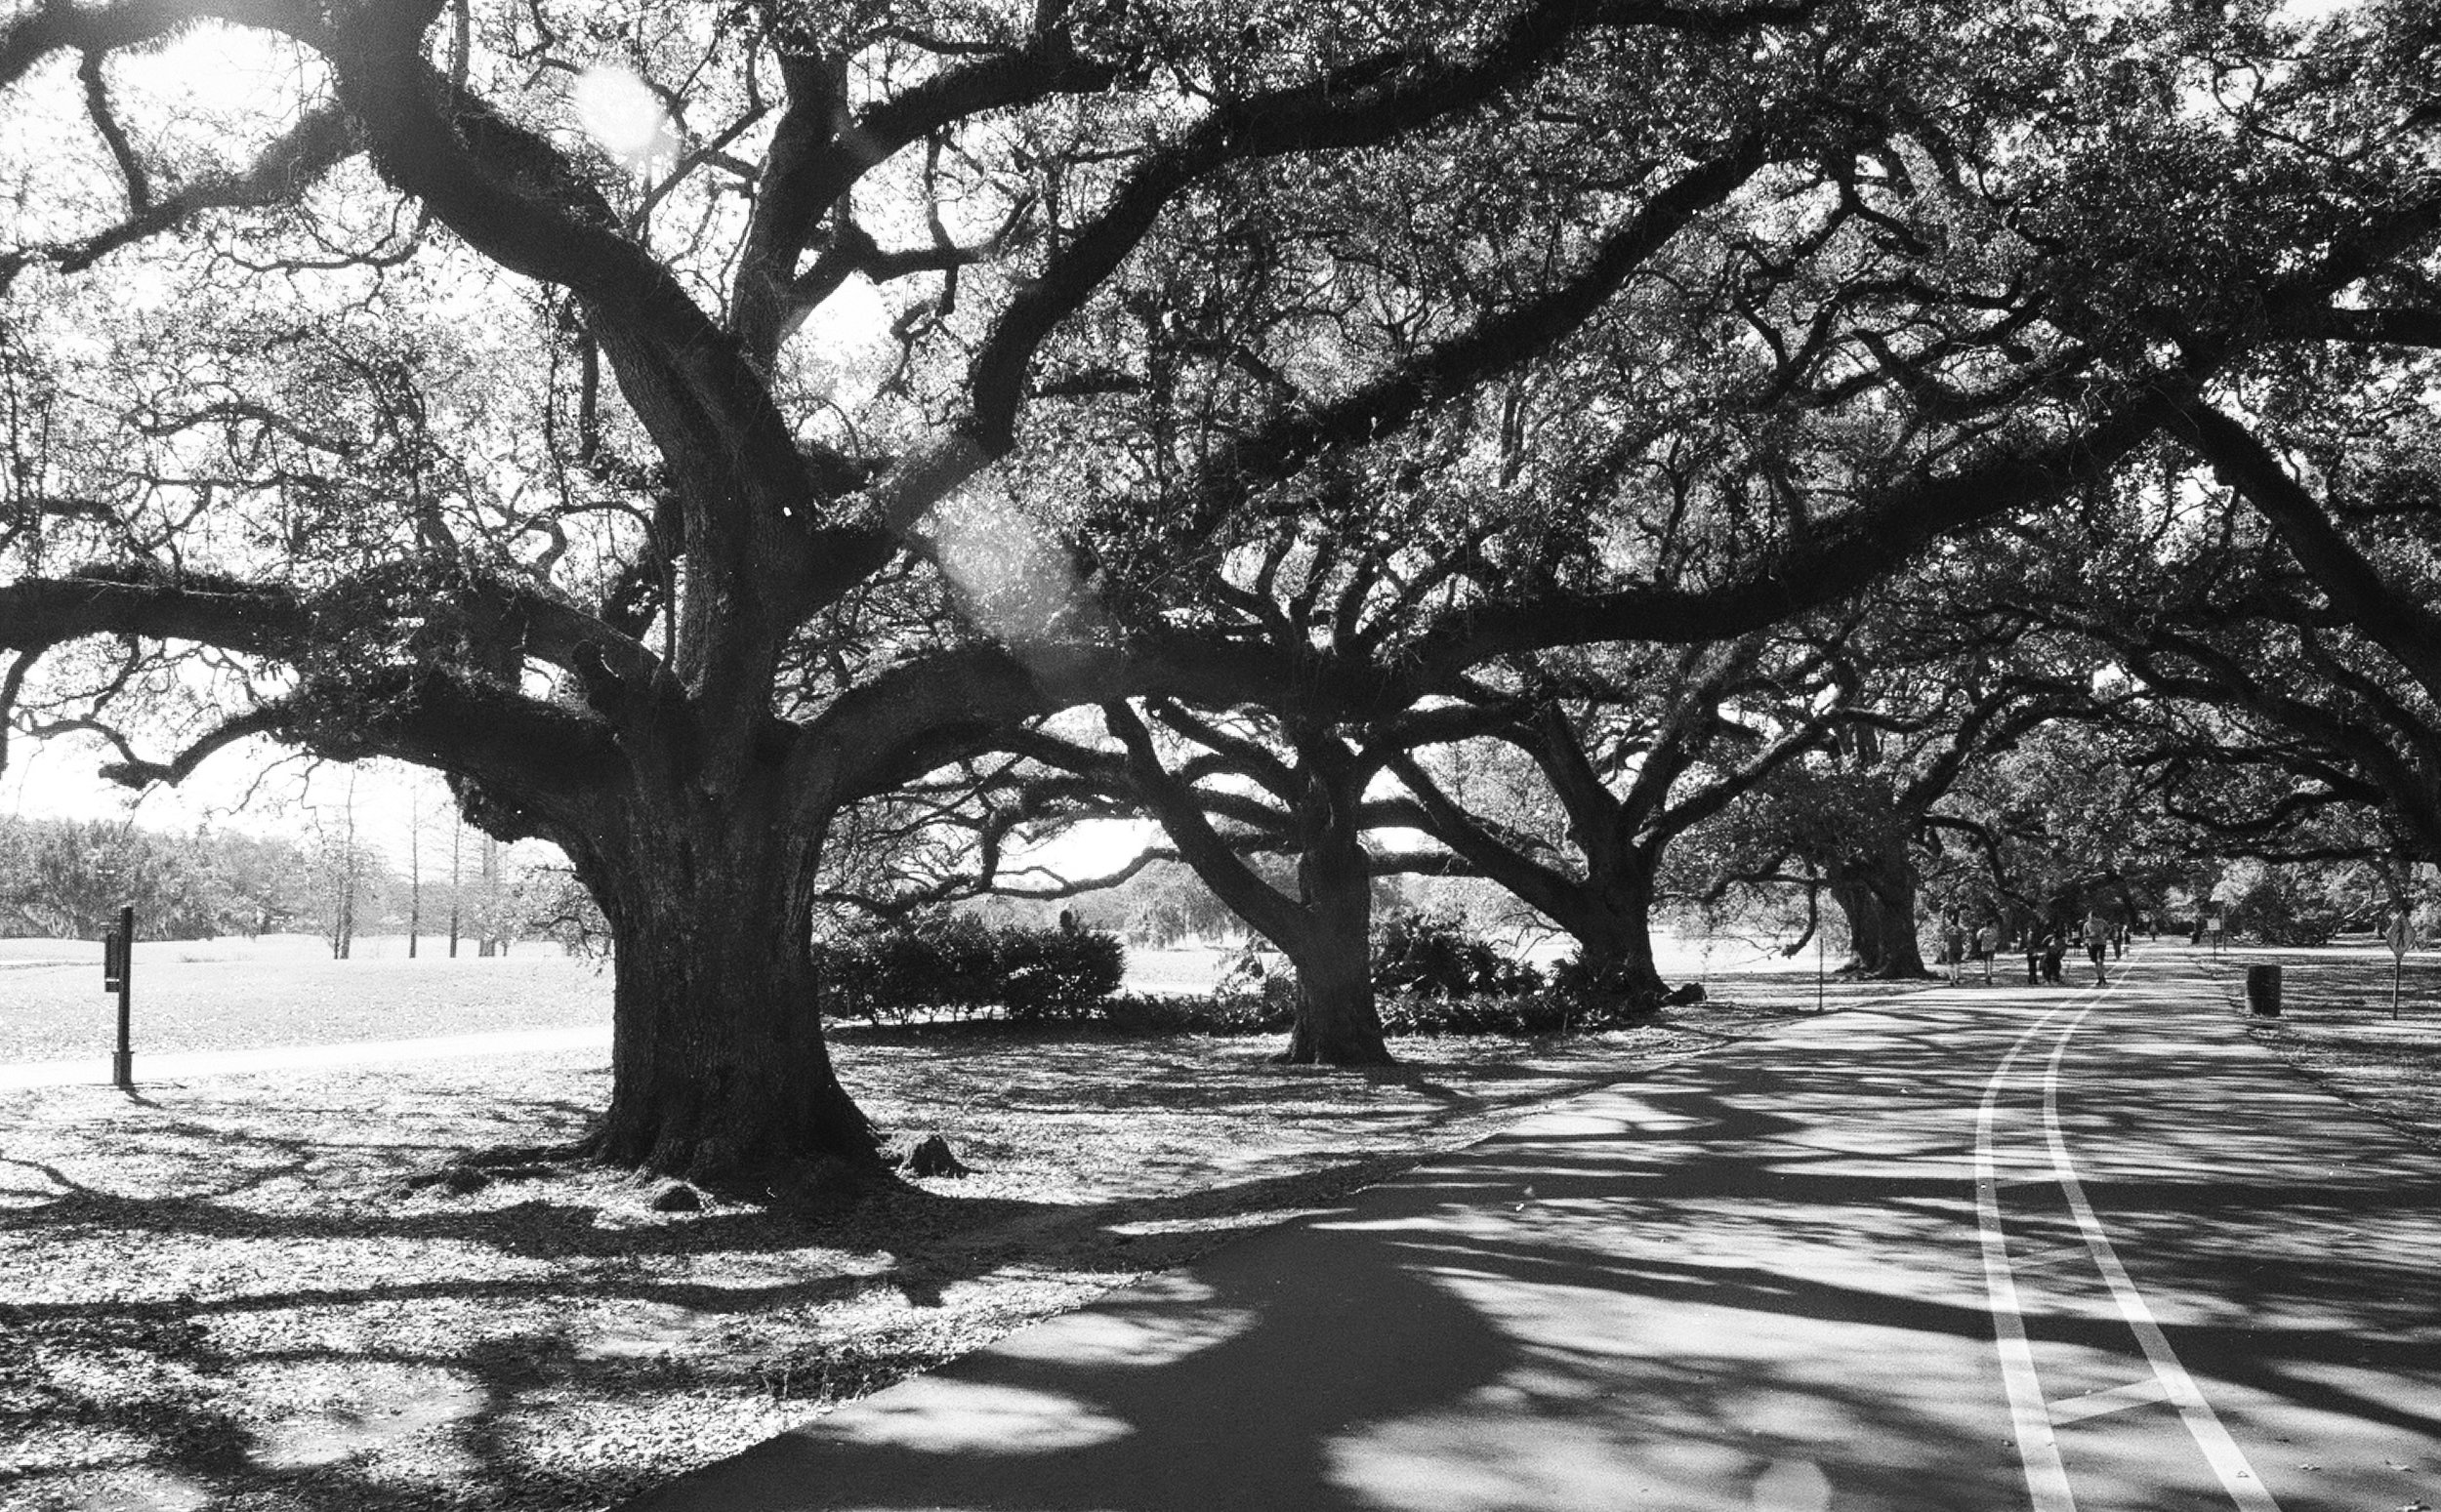 Audubon Park, New Orleans, Louisiana